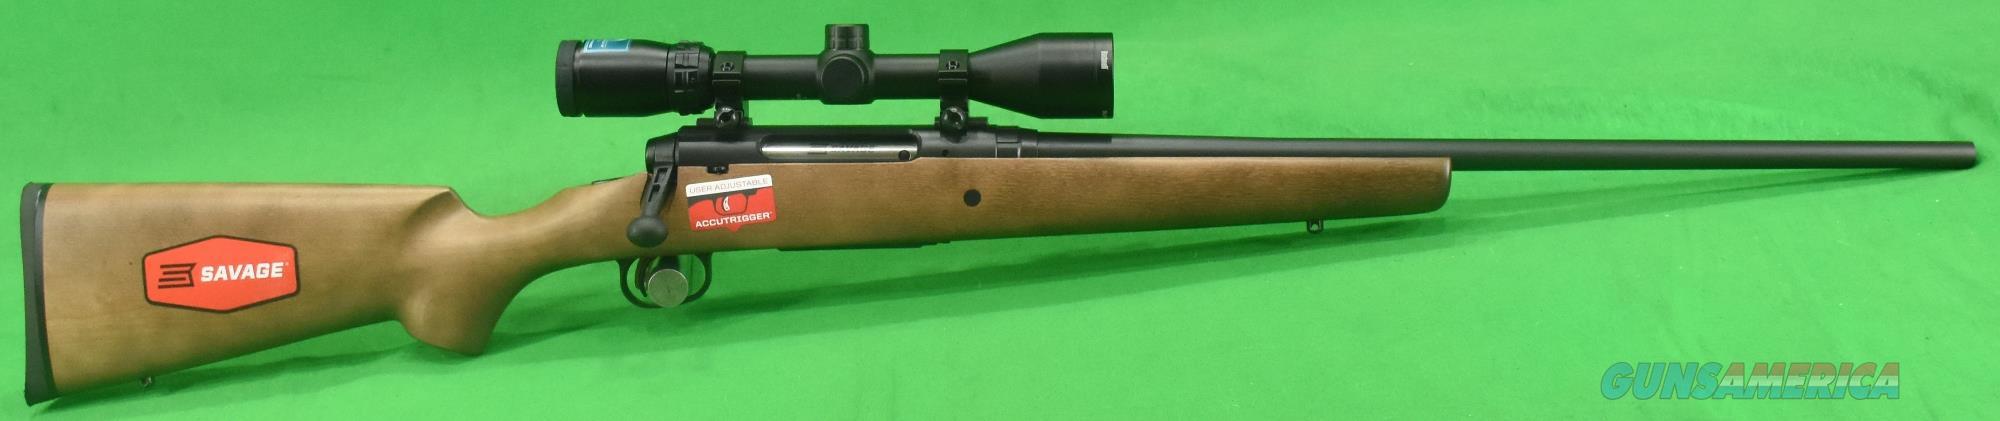 Axis II XP Hardwood 308Win 22In  22553  Guns > Rifles > Savage Rifles > Axis